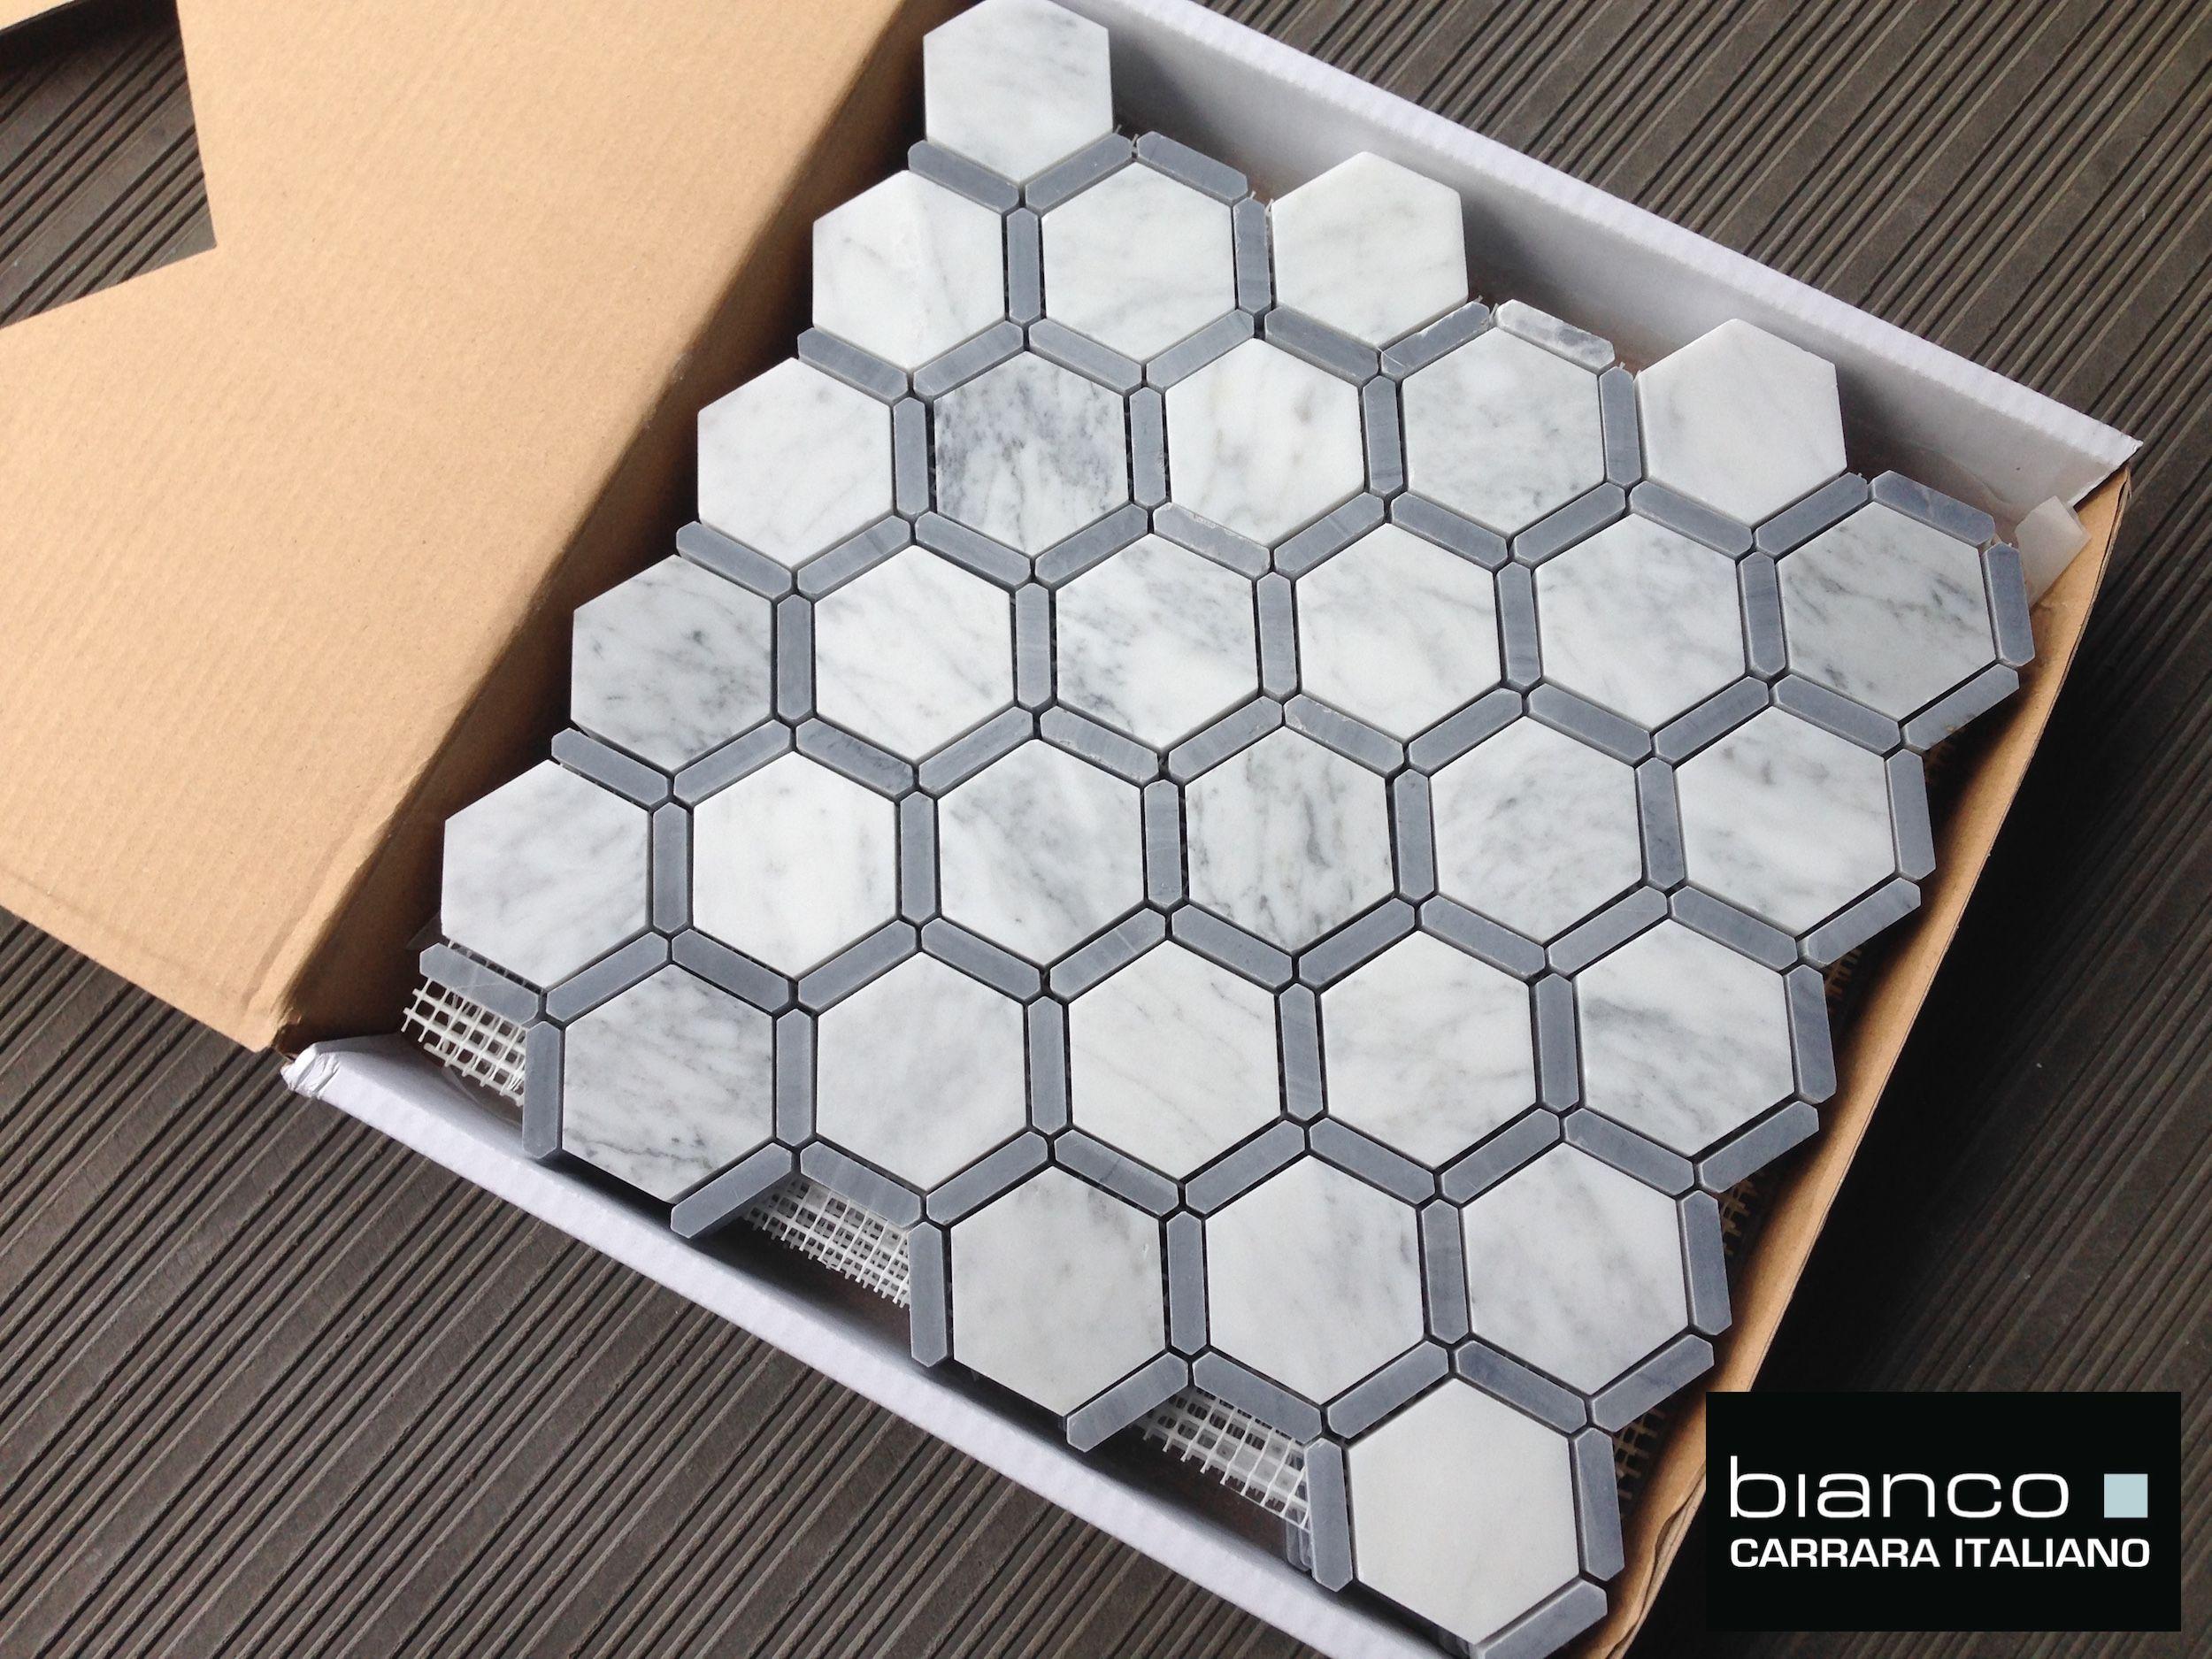 Italian carrara hexagon mosaic with bardiglio gray strip for italian carrara hexagon mosaic with bardiglio gray strip for 1295 a square foot perfect for dailygadgetfo Image collections